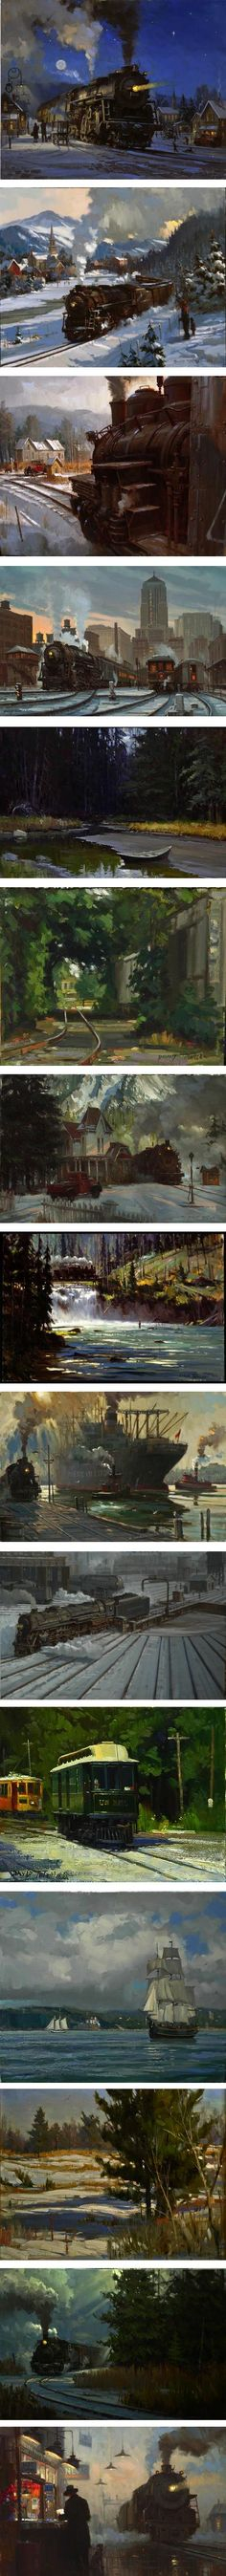 David Tutwiler, trains, landscape paintings